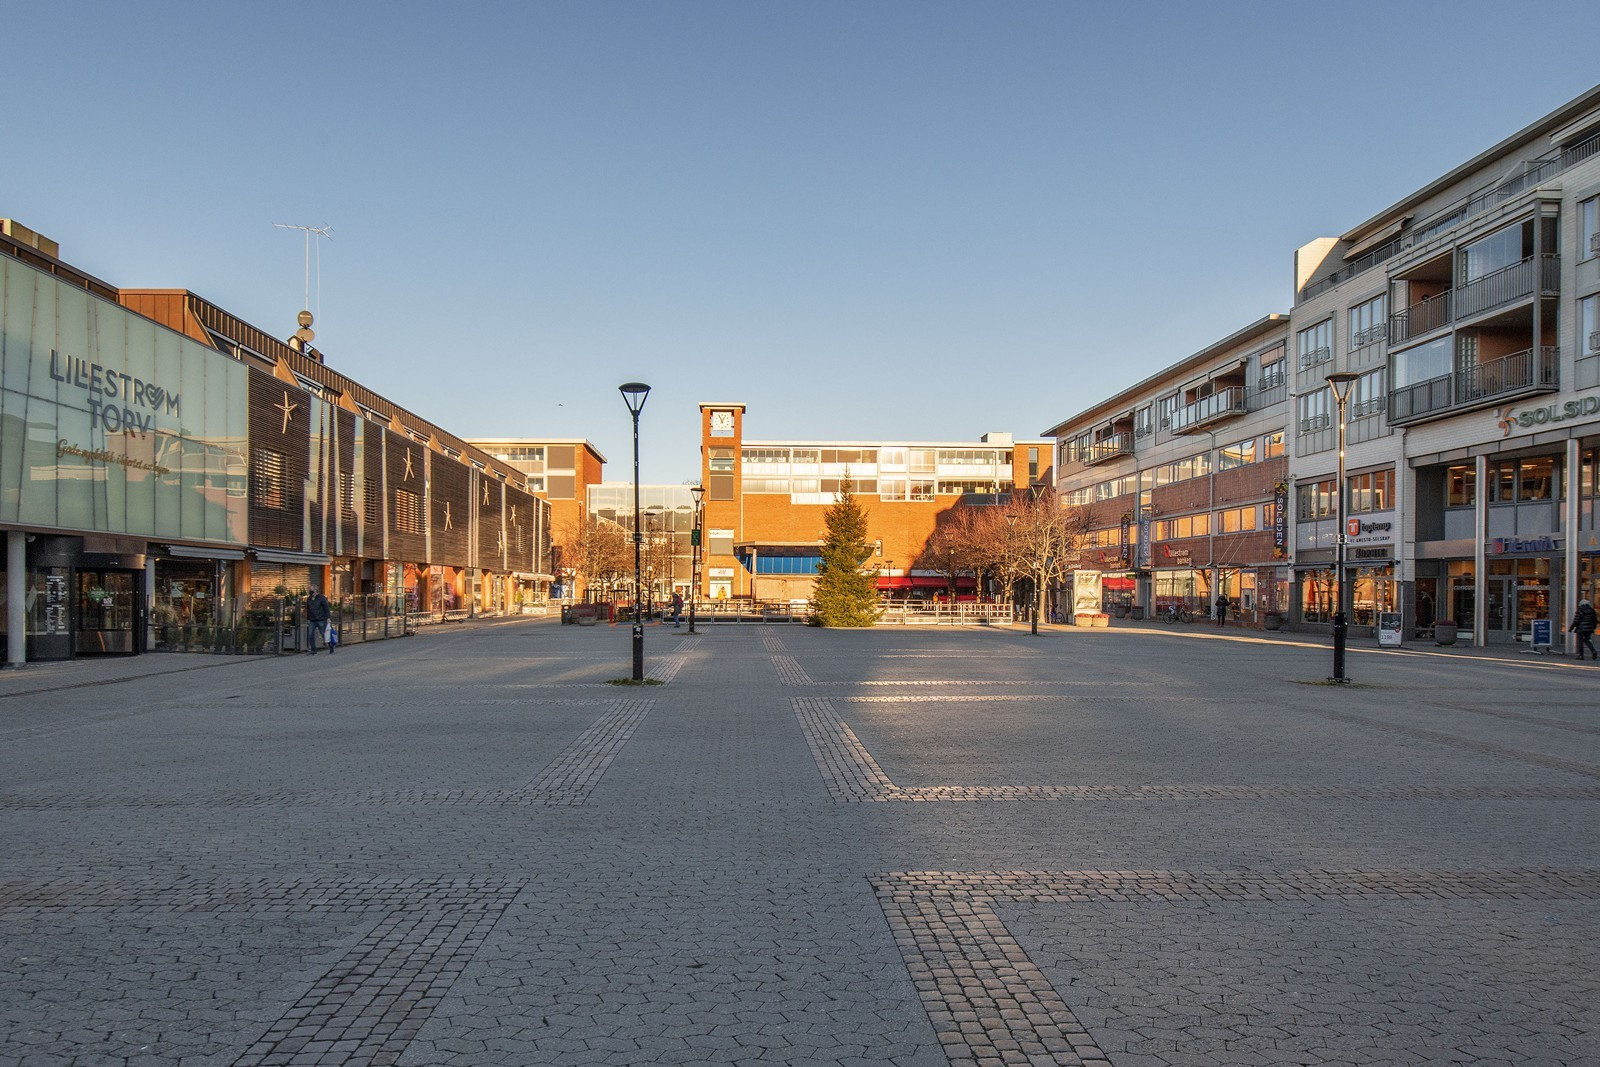 Nærmeste nabo til Lillestrøm Torv